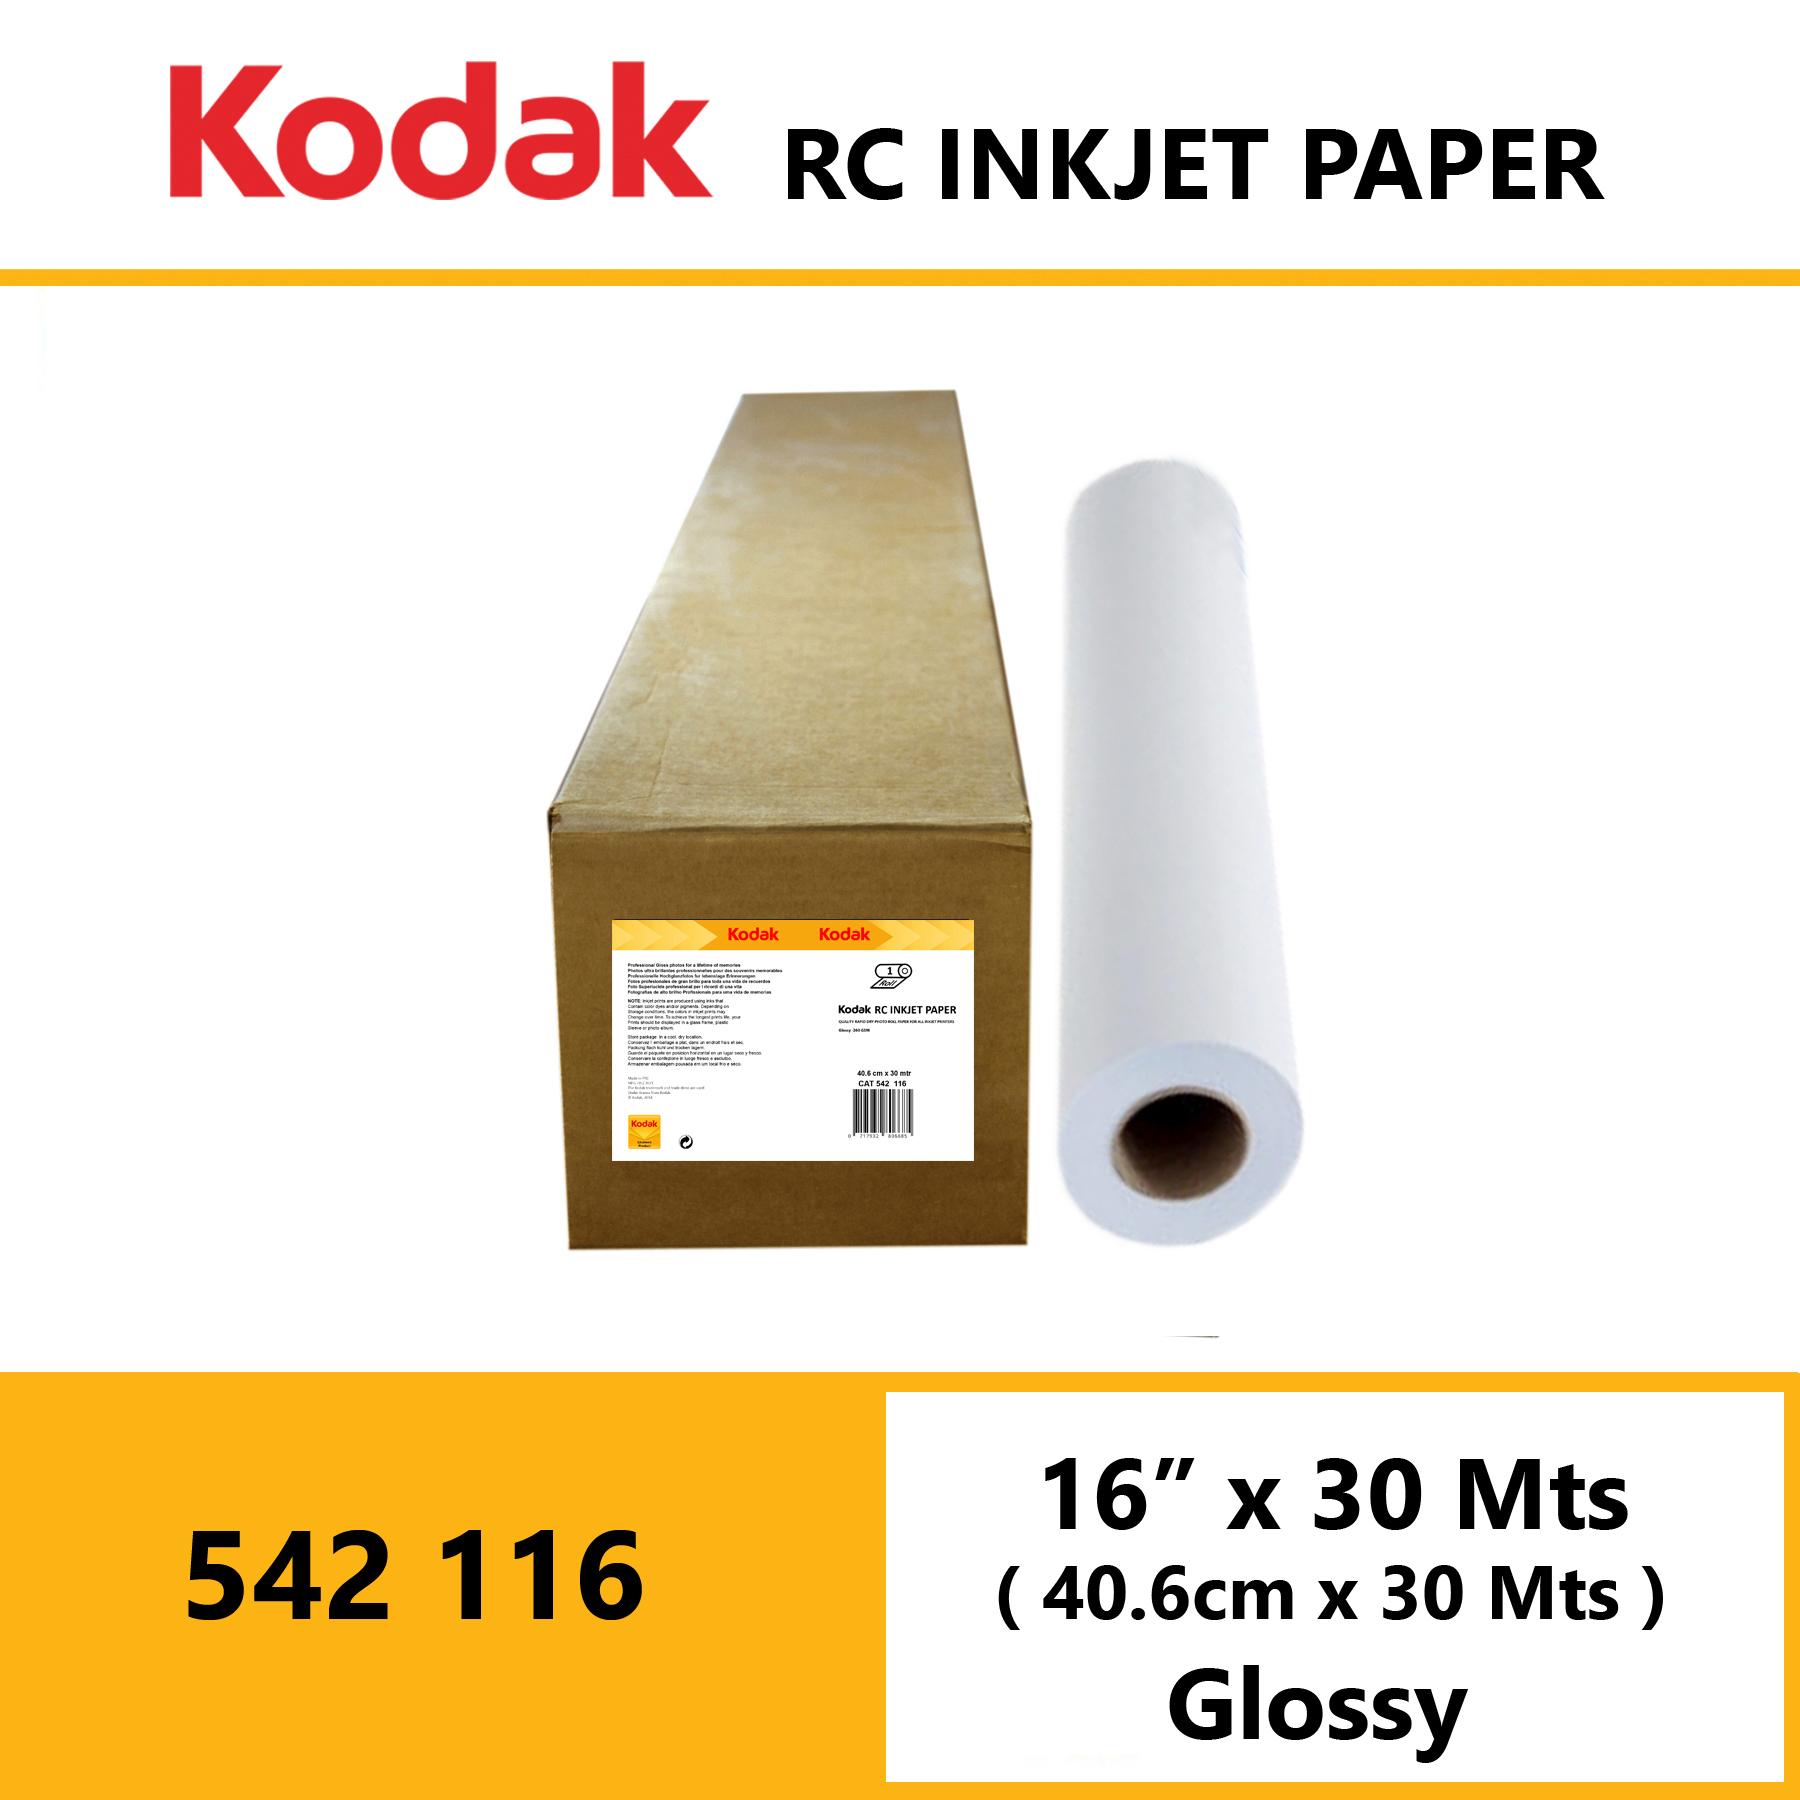 "Kodak Inkjet RC Paper 16"" x 30 Mtrs Glossy"